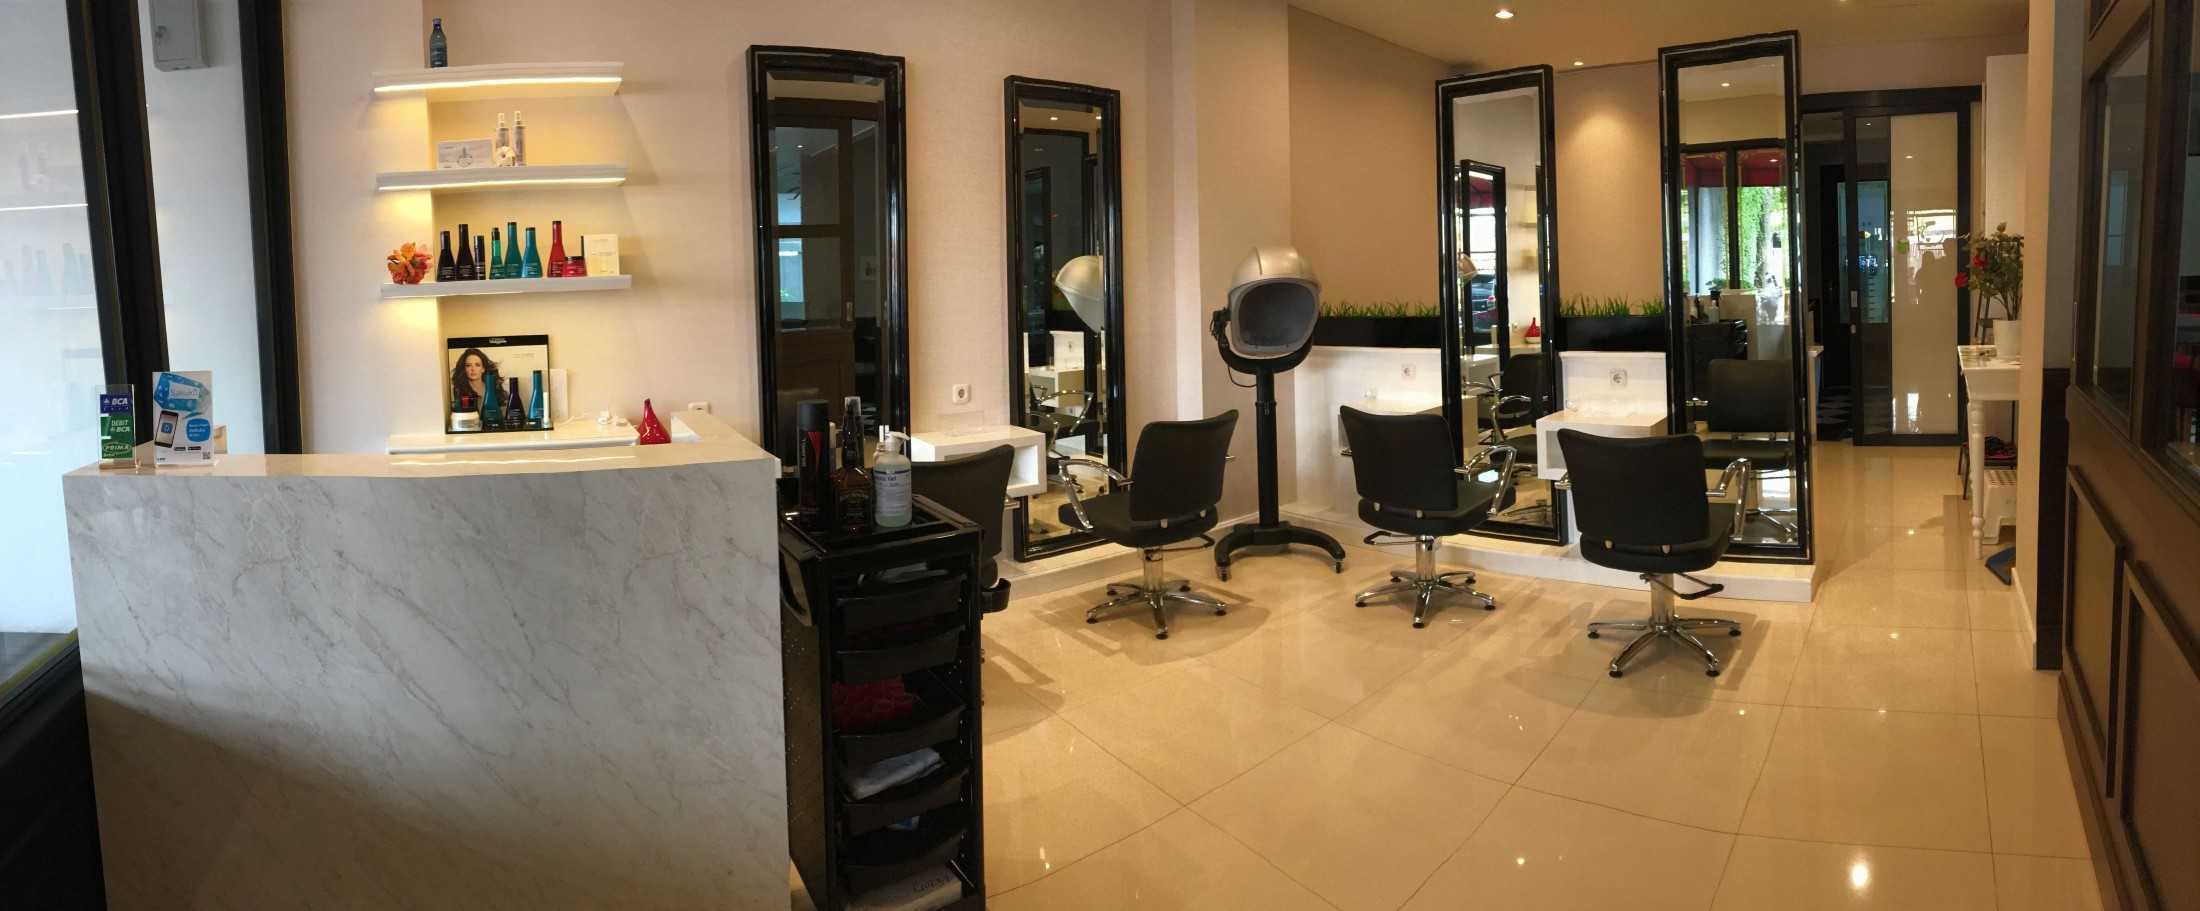 Cds Studio W Salon Jakarta, Daerah Khusus Ibukota Jakarta, Indonesia Jakarta, Daerah Khusus Ibukota Jakarta, Indonesia Cds-Studio-W-Salon  70445